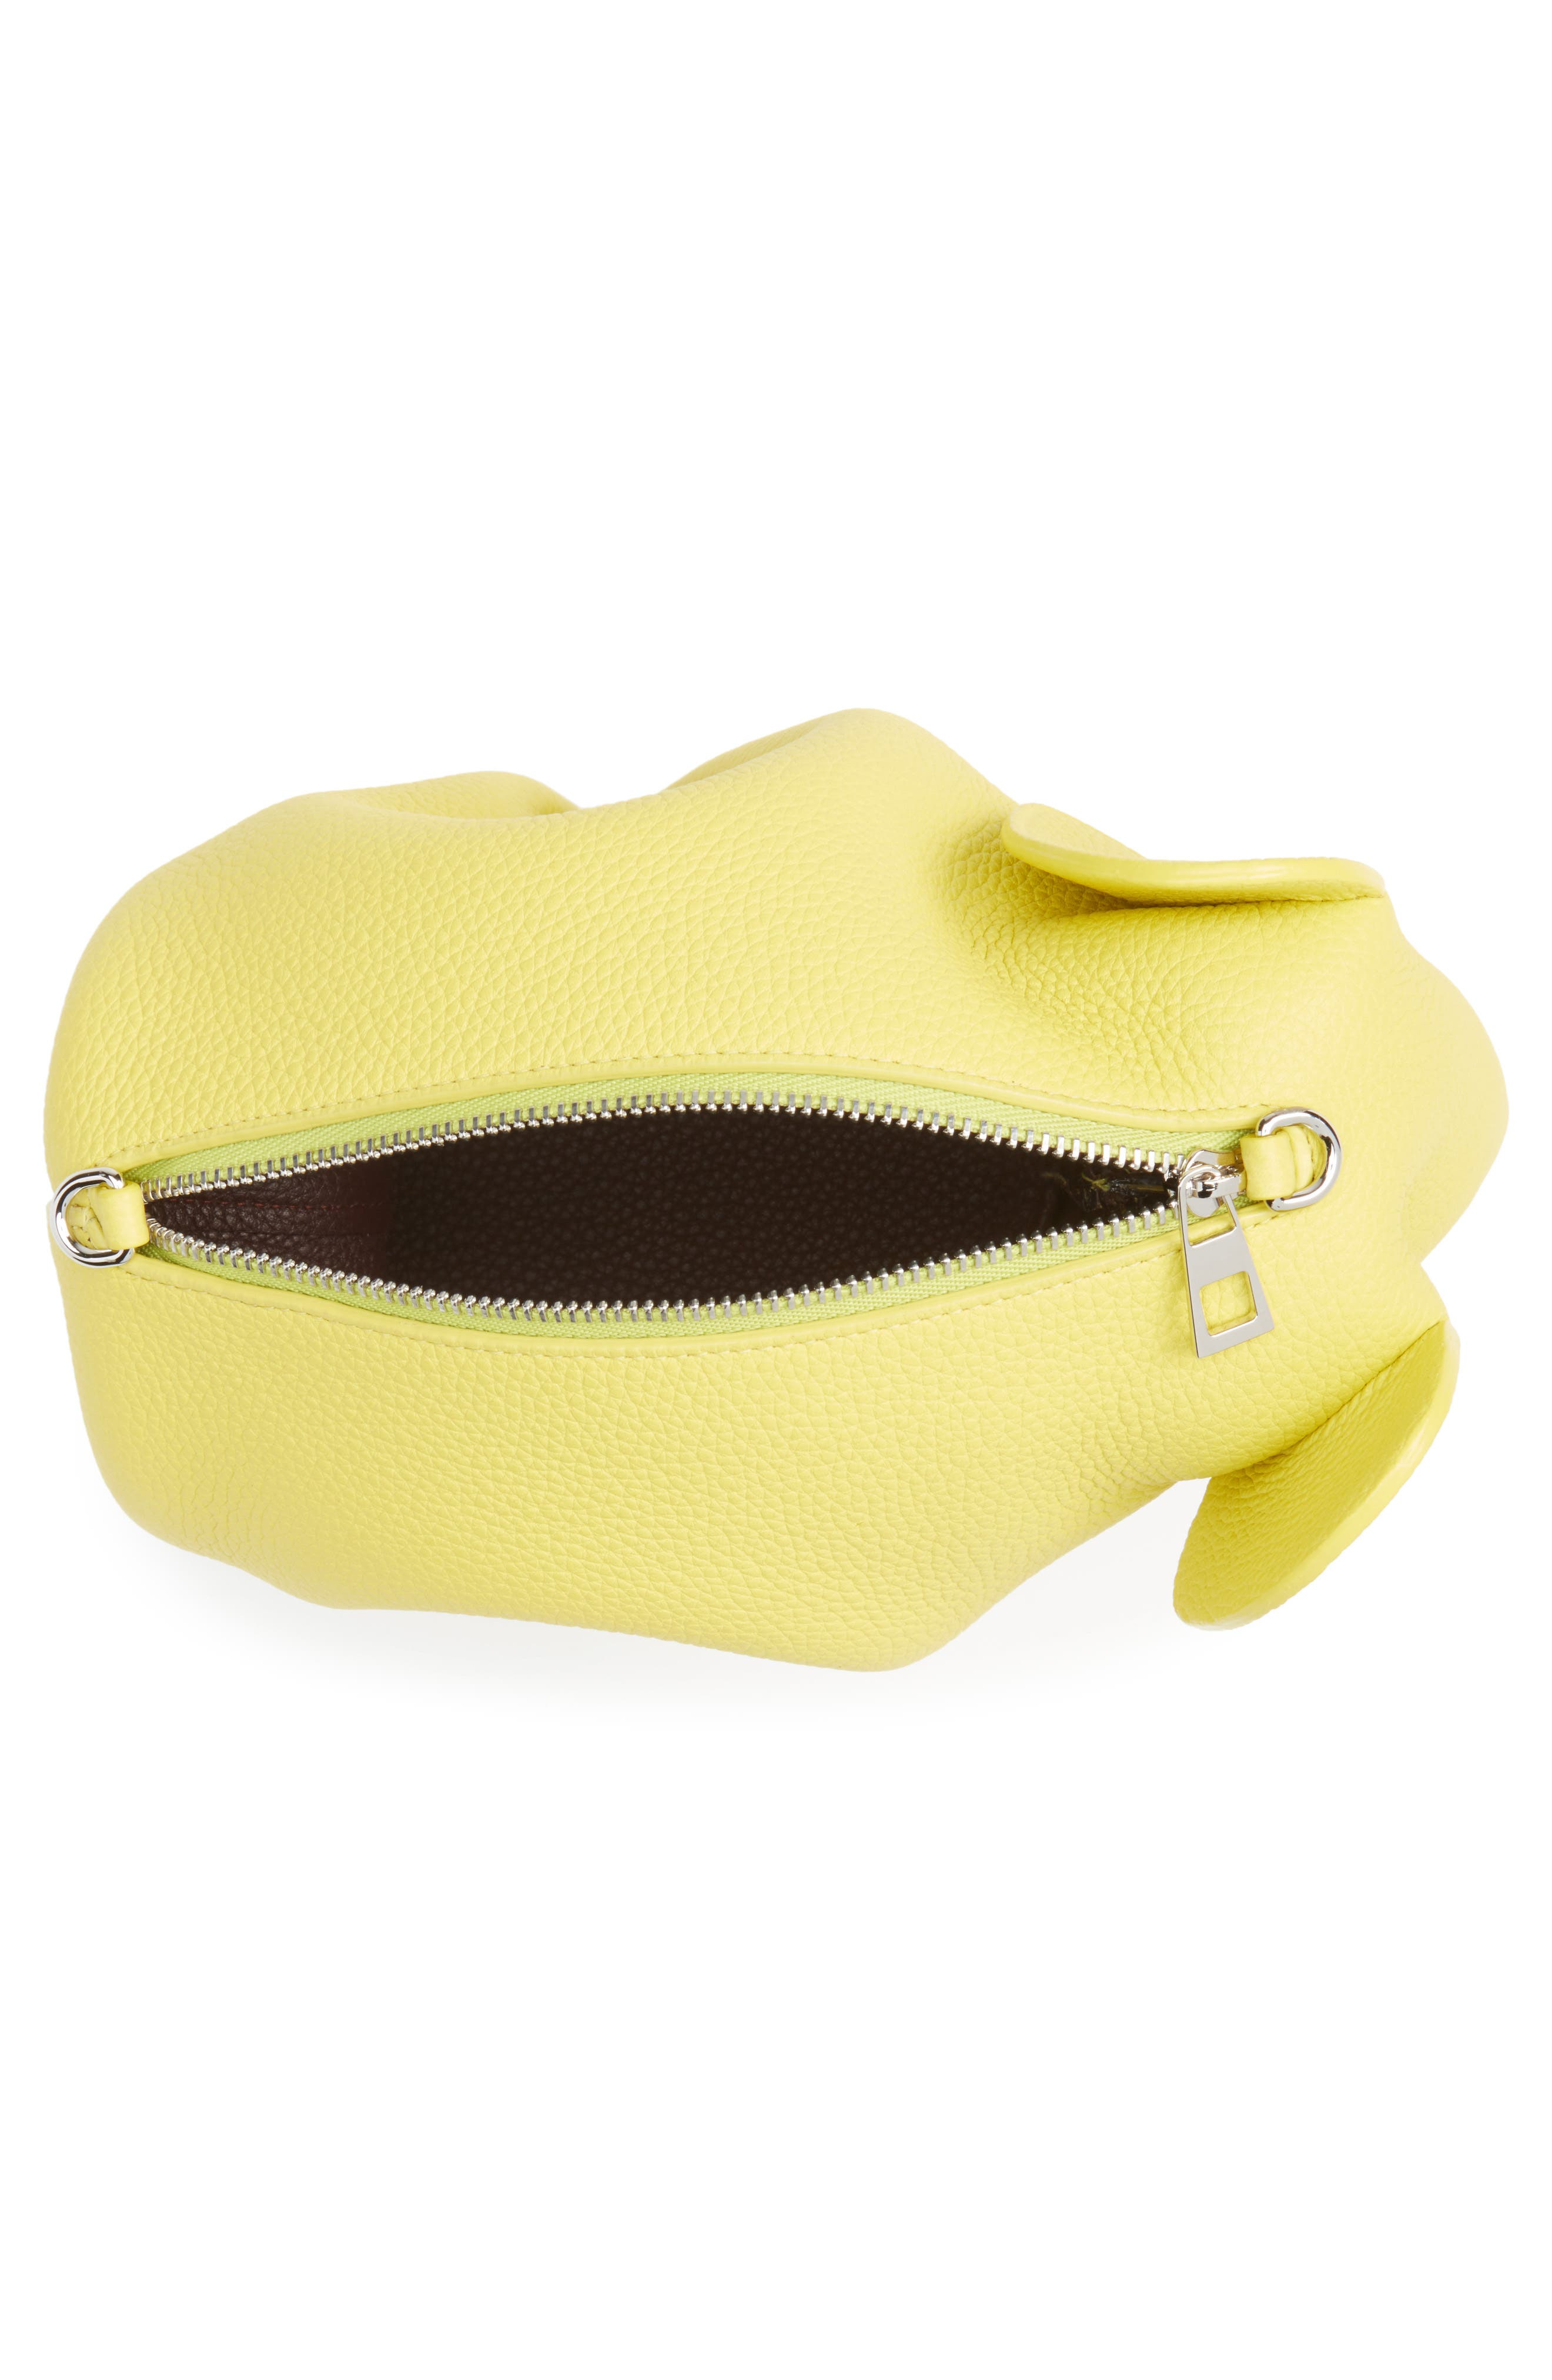 Mini Elephant Calfskin Crossbody Bag,                             Alternate thumbnail 4, color,                             Yellow Lemon